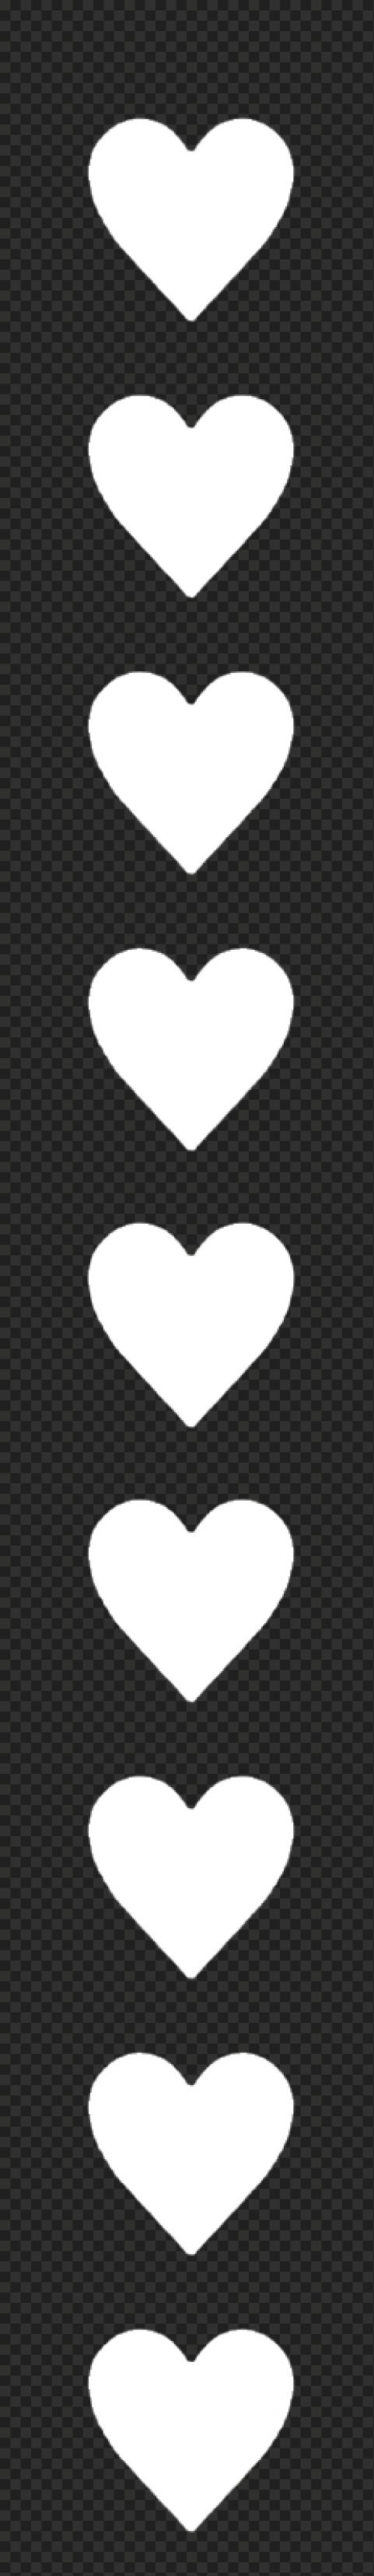 HD White Hearts Emoji Vertical Border PNG